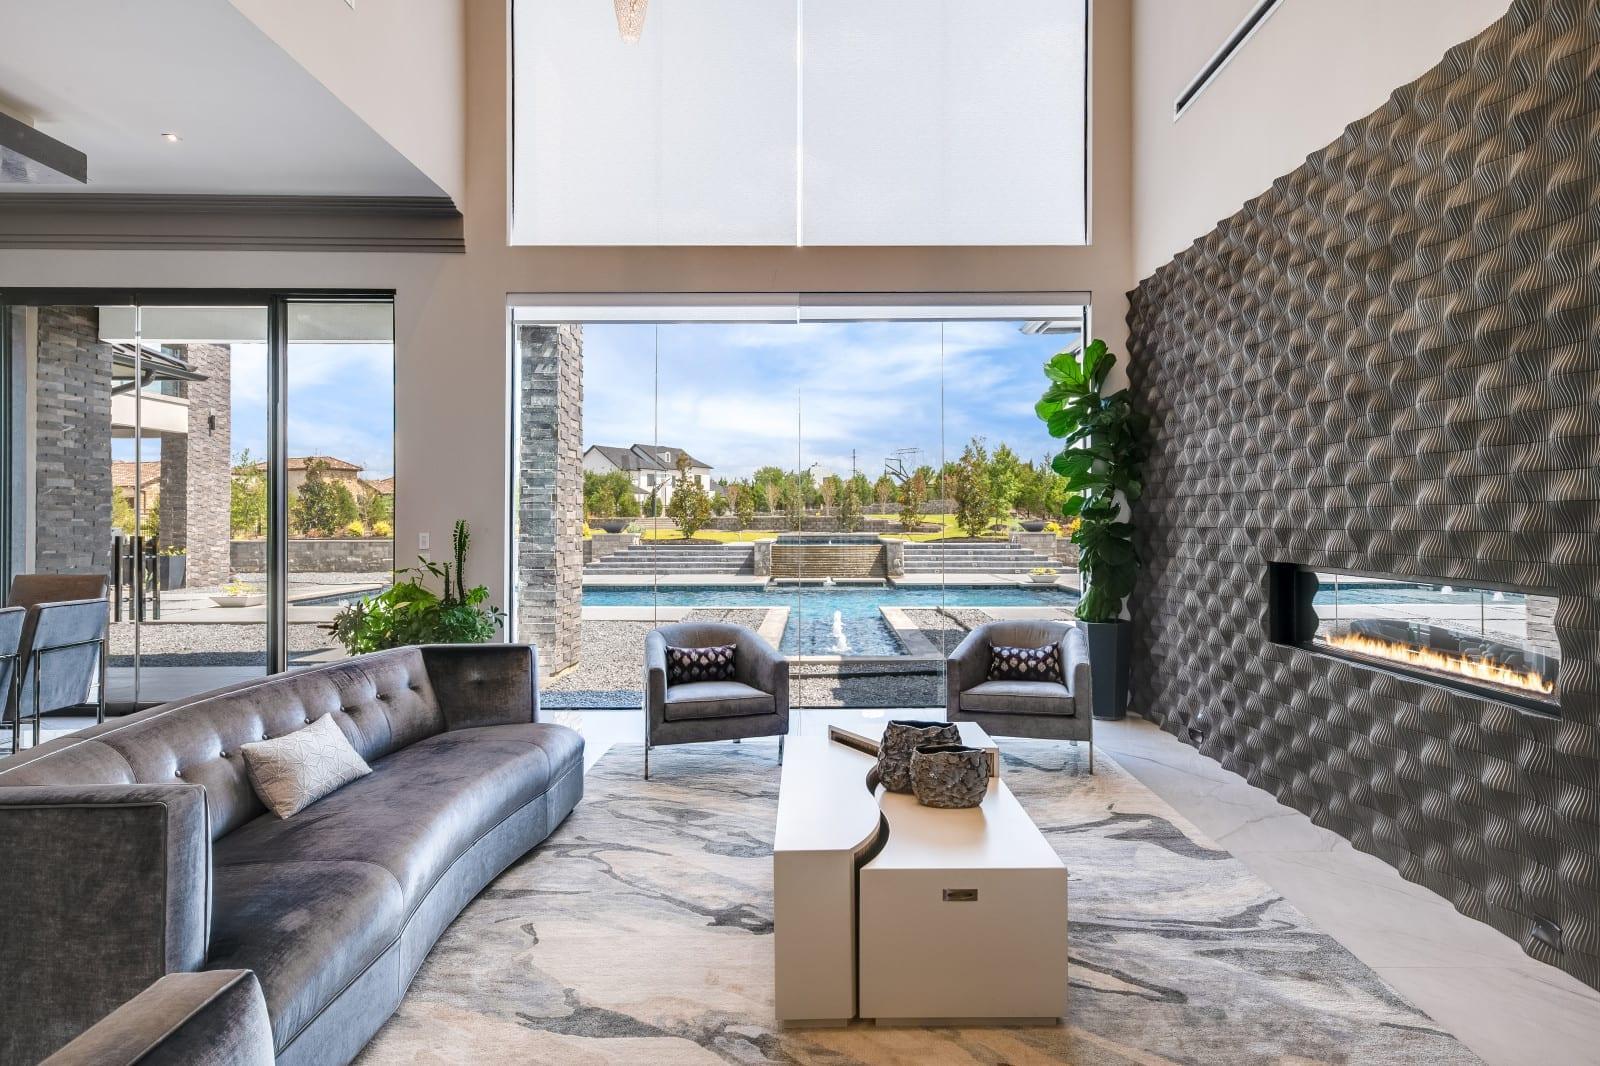 Custom Home Build and Interior Design # 2 - Millennial Design + Build, Custom Home Builders in Dallas Texas, modern style homes, Property Evaluator, Interior Designers, using BIM Technology and Home 3D Model.